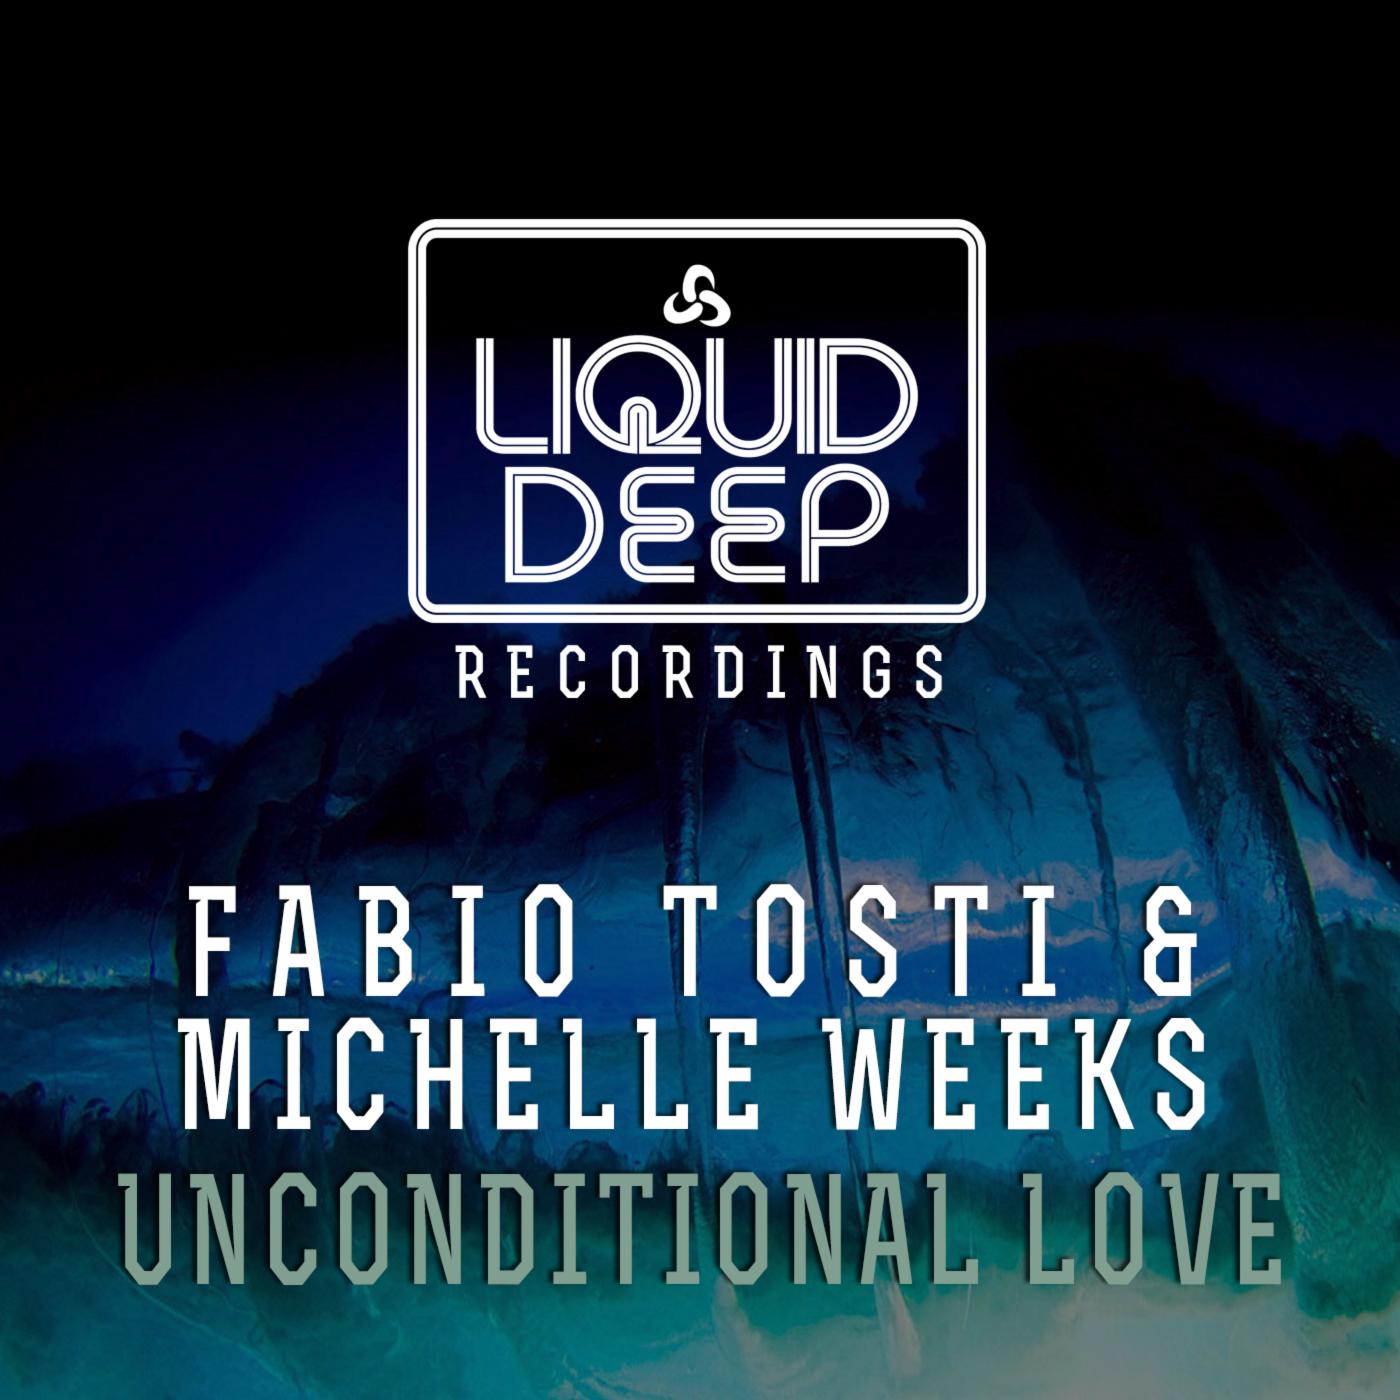 Fabio Tosti & Michelle Weeks (Unconditional Love) ok